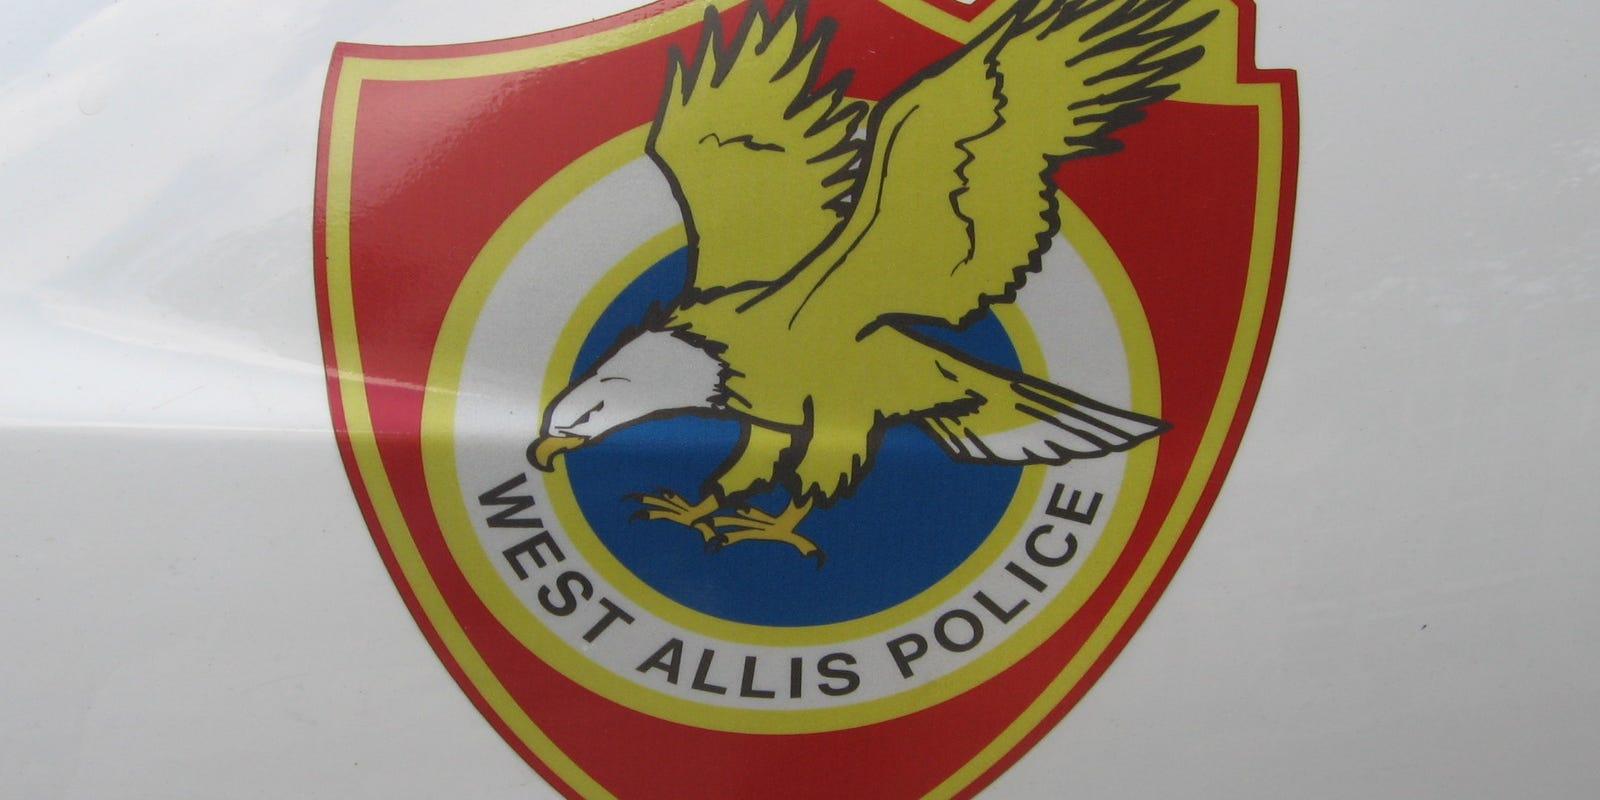 Allis Suicide west allis police id victims of apparent murder-suicide